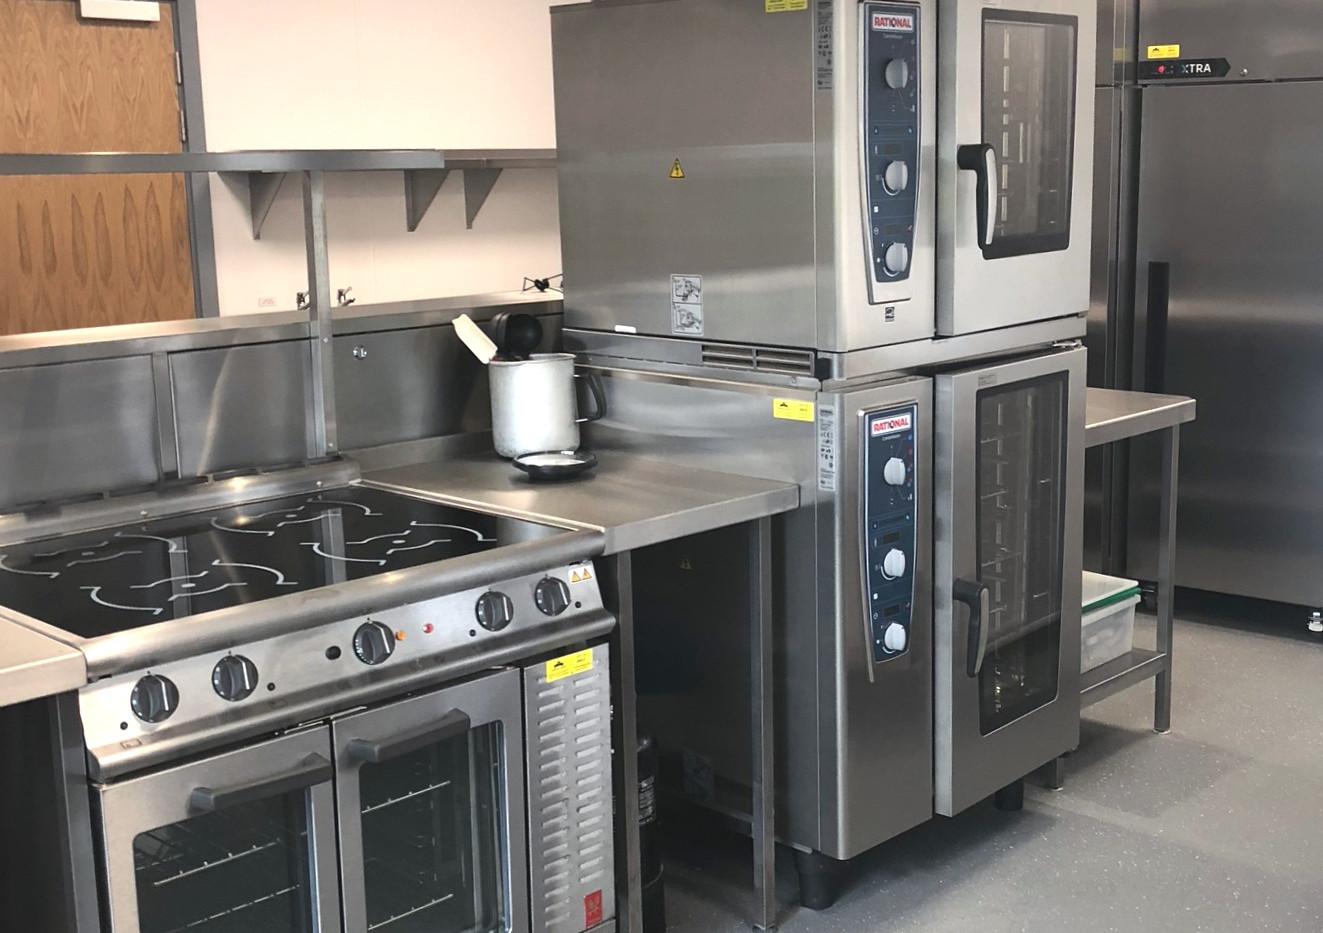 P479 Copley F2 Kitchen